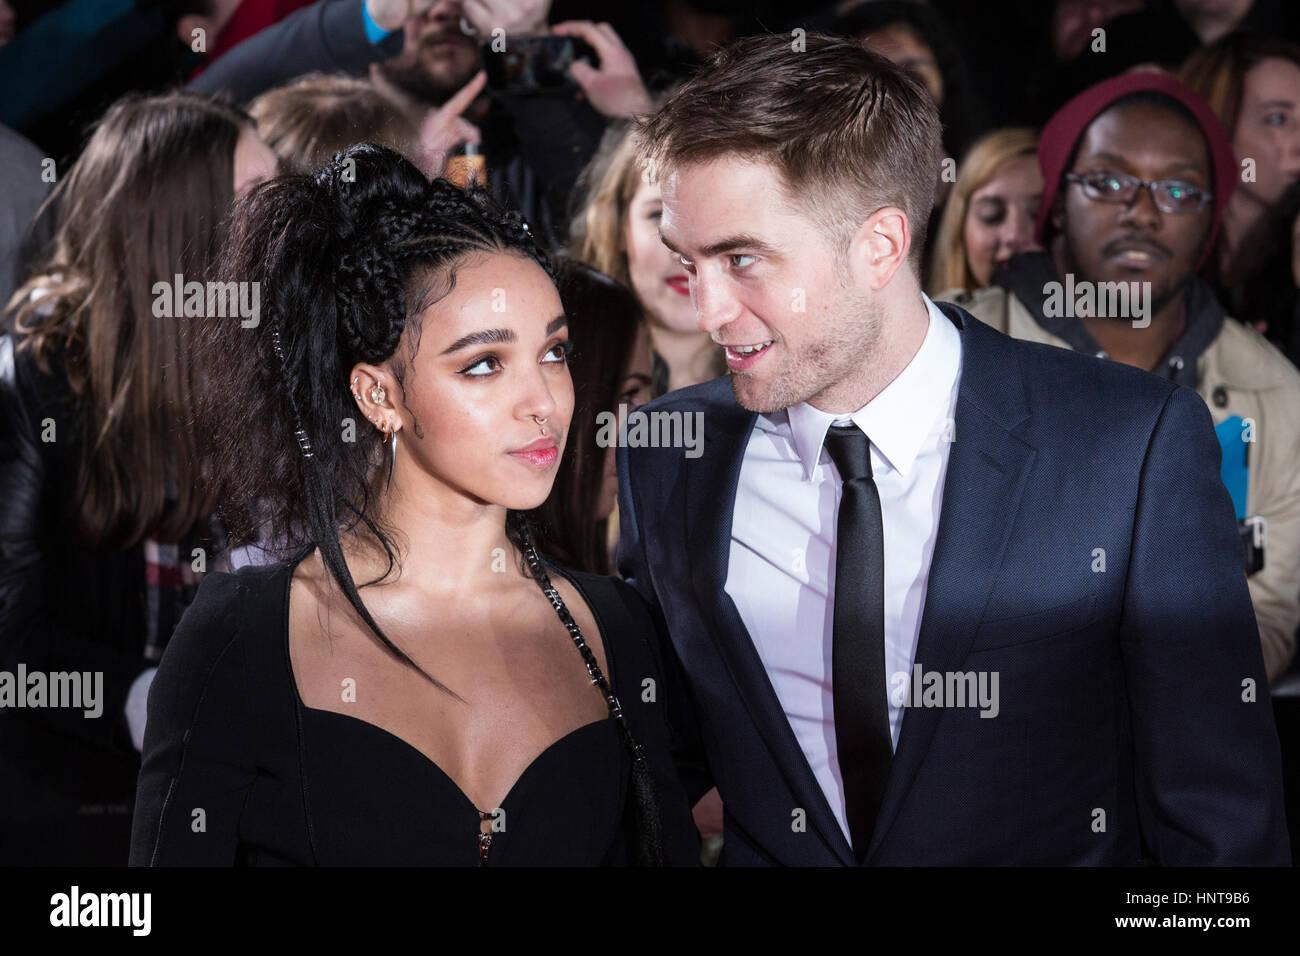 London, UK. 16th Feb, 2017. FKA Twigs and Robert Pattinson. UK Premiere in celebration of Bazaar Best of British - Stock Image